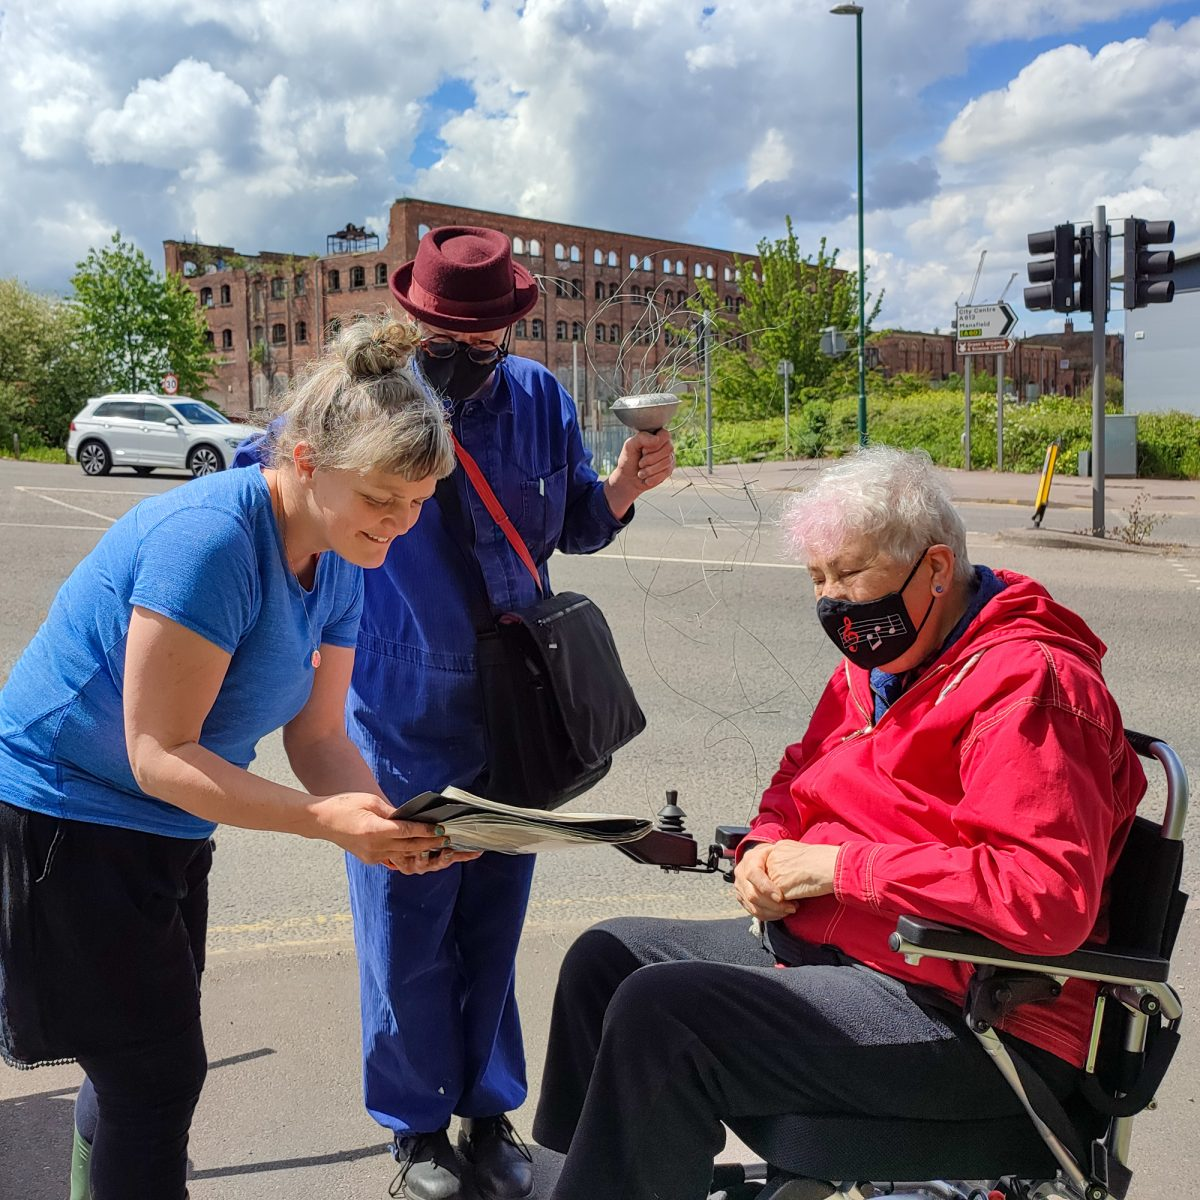 Artist shows map older woman using a wheelchair